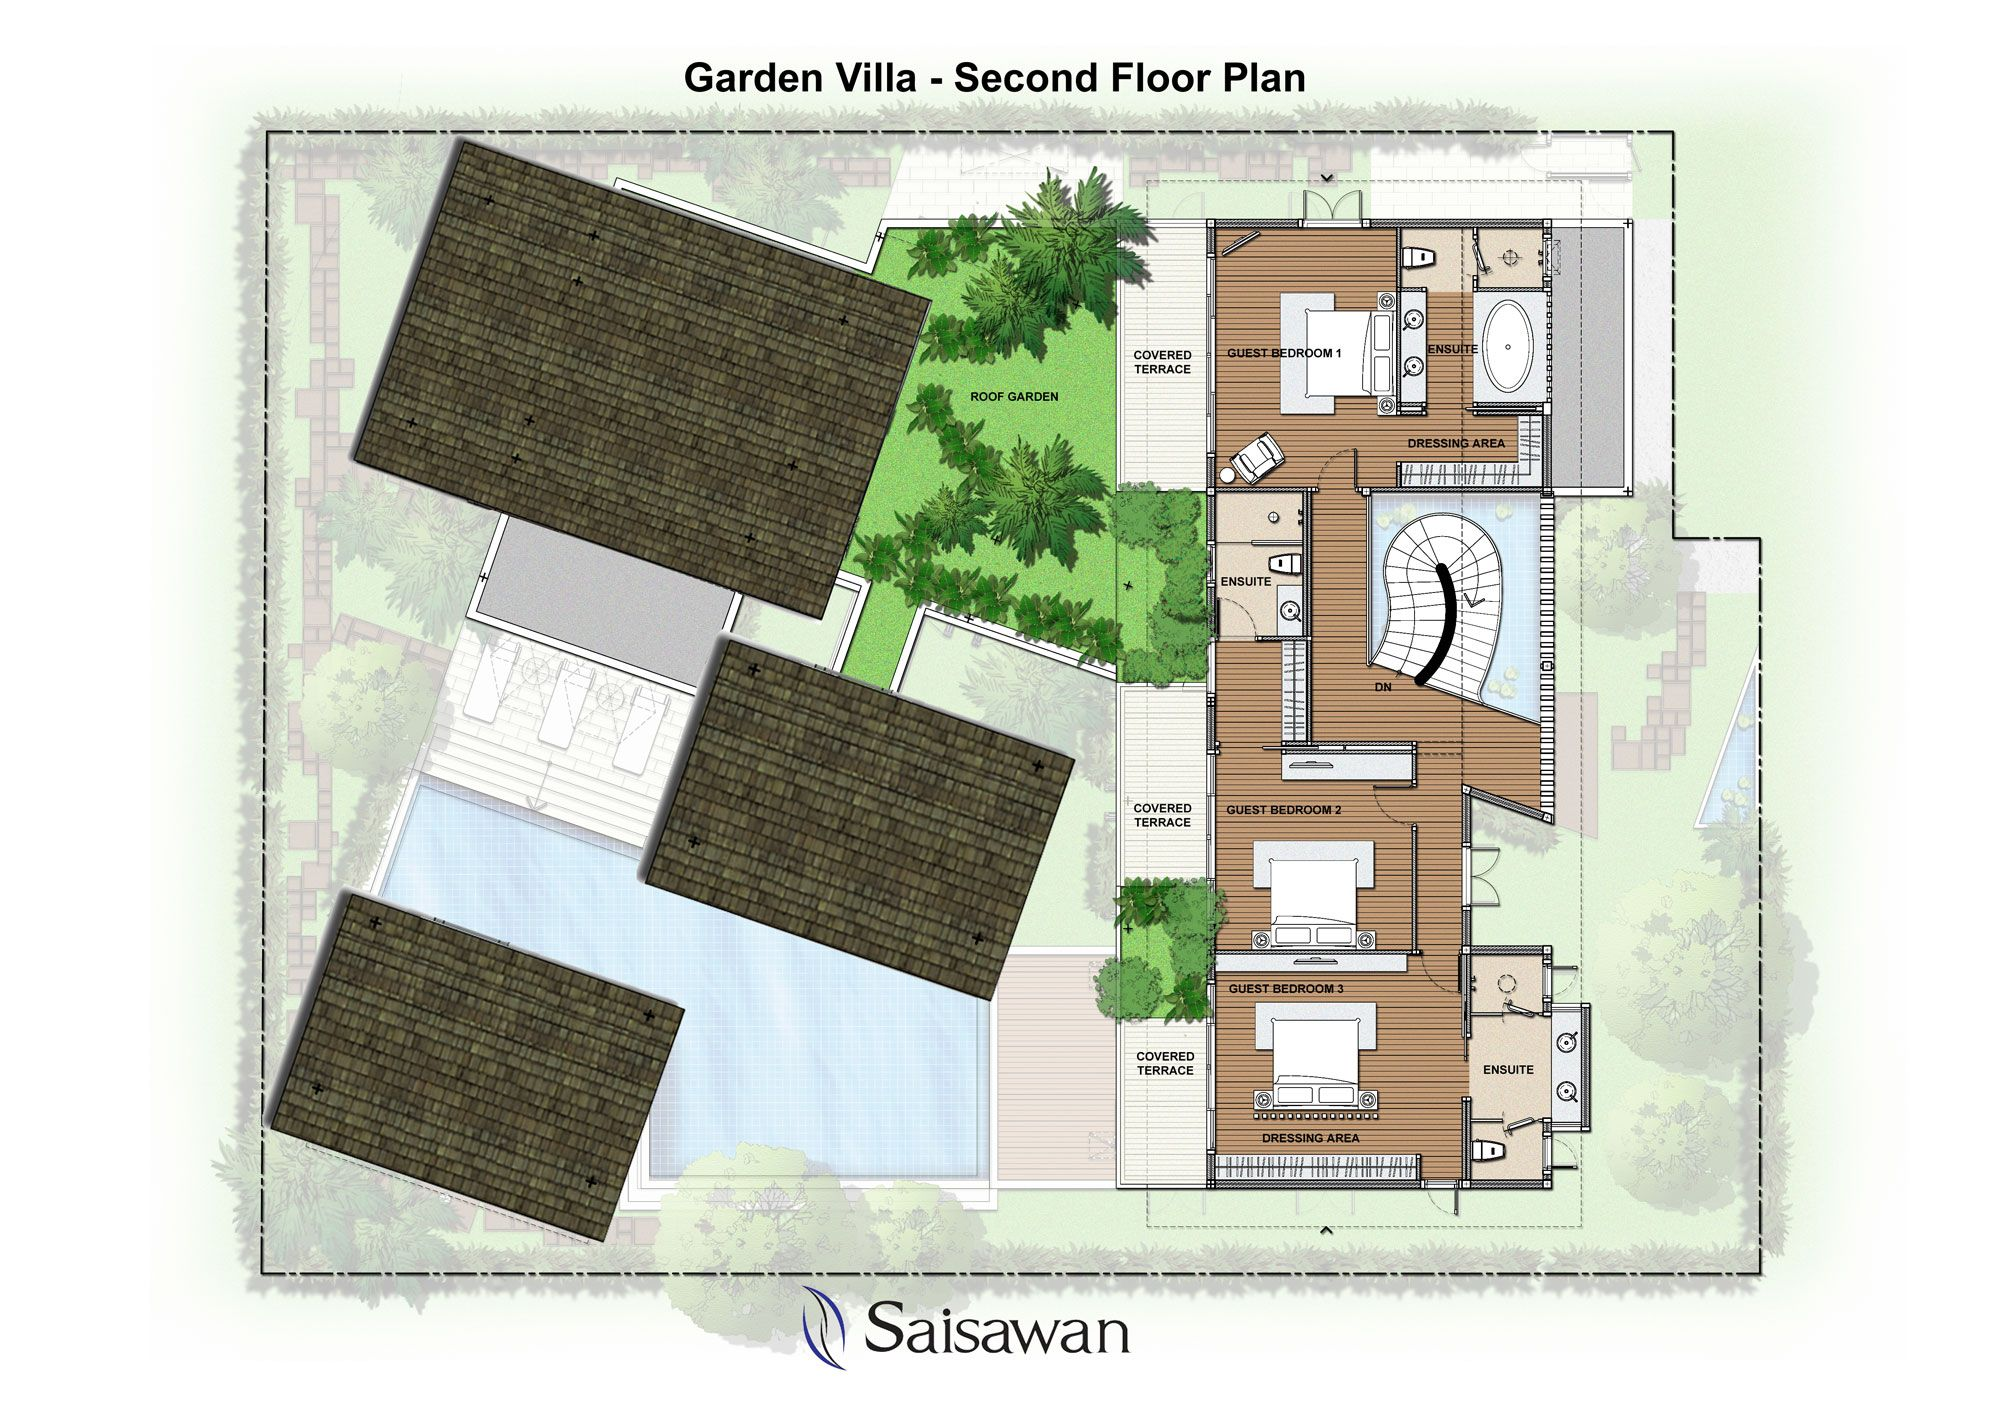 Saisawan Garden Villas Second Floor Plan Floor Plans Garden Villa House Plans